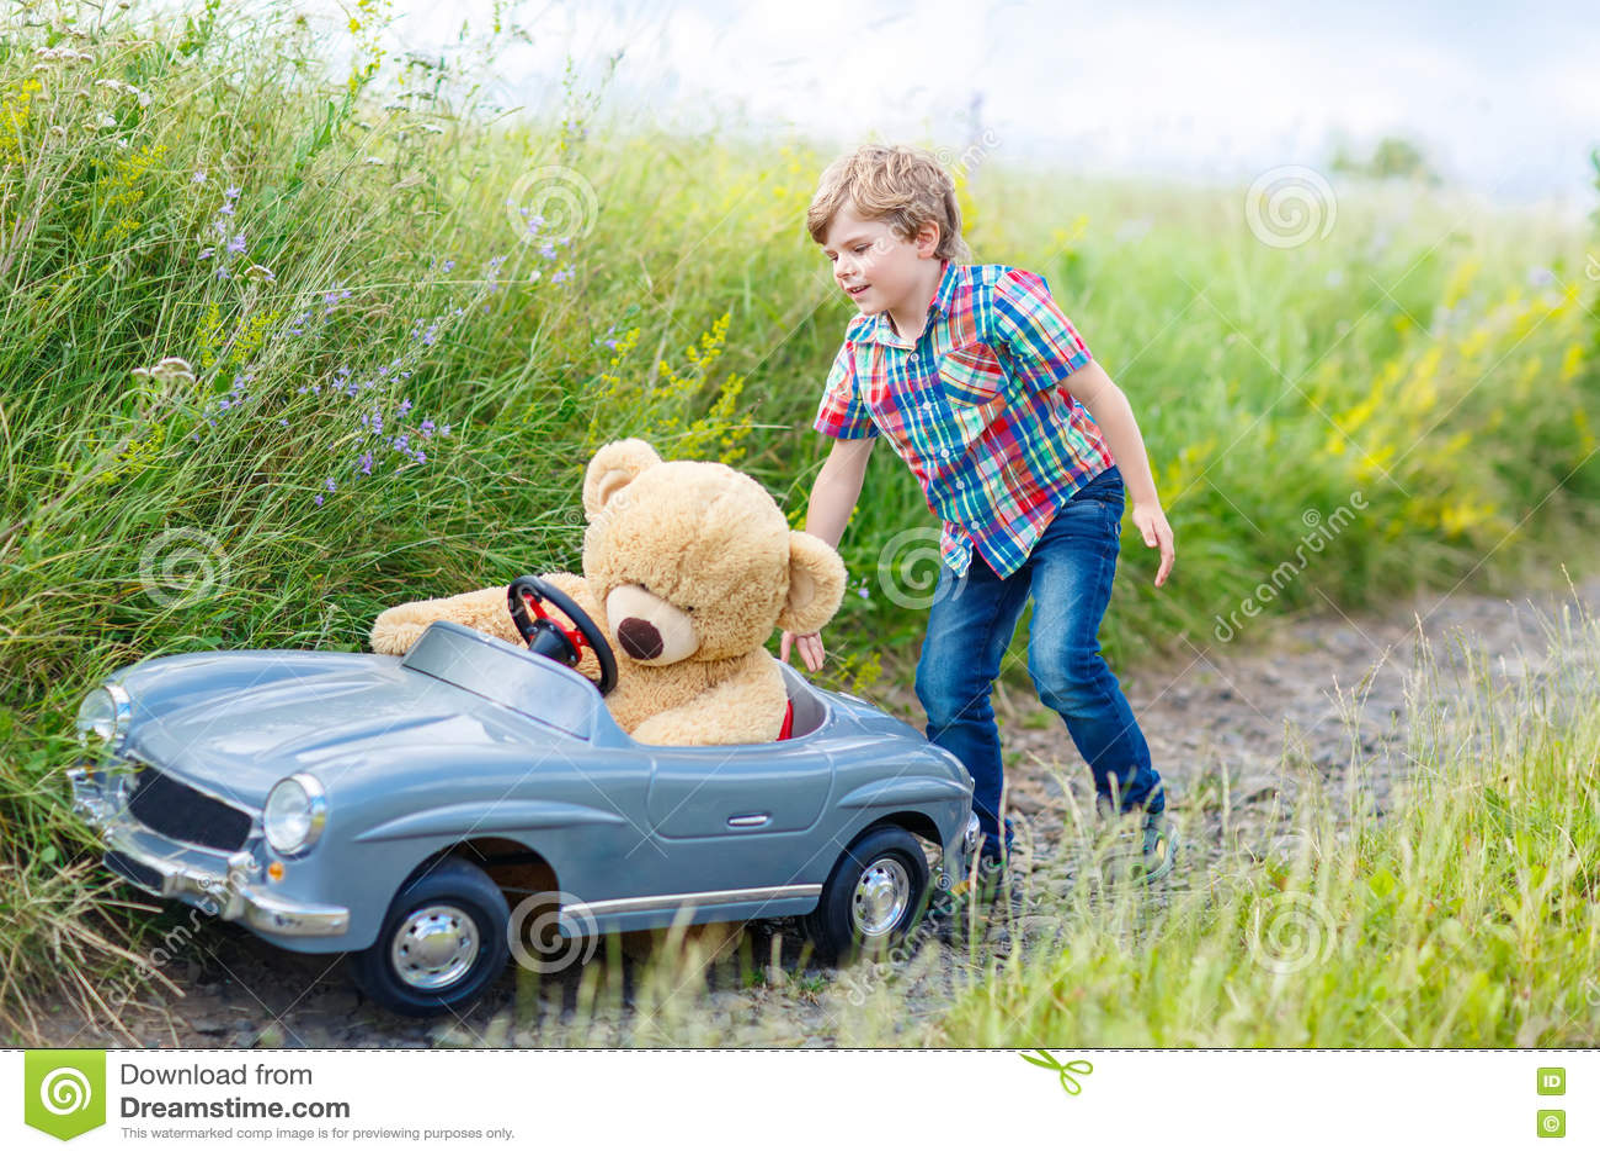 bear boy car child fun having kid landscape little